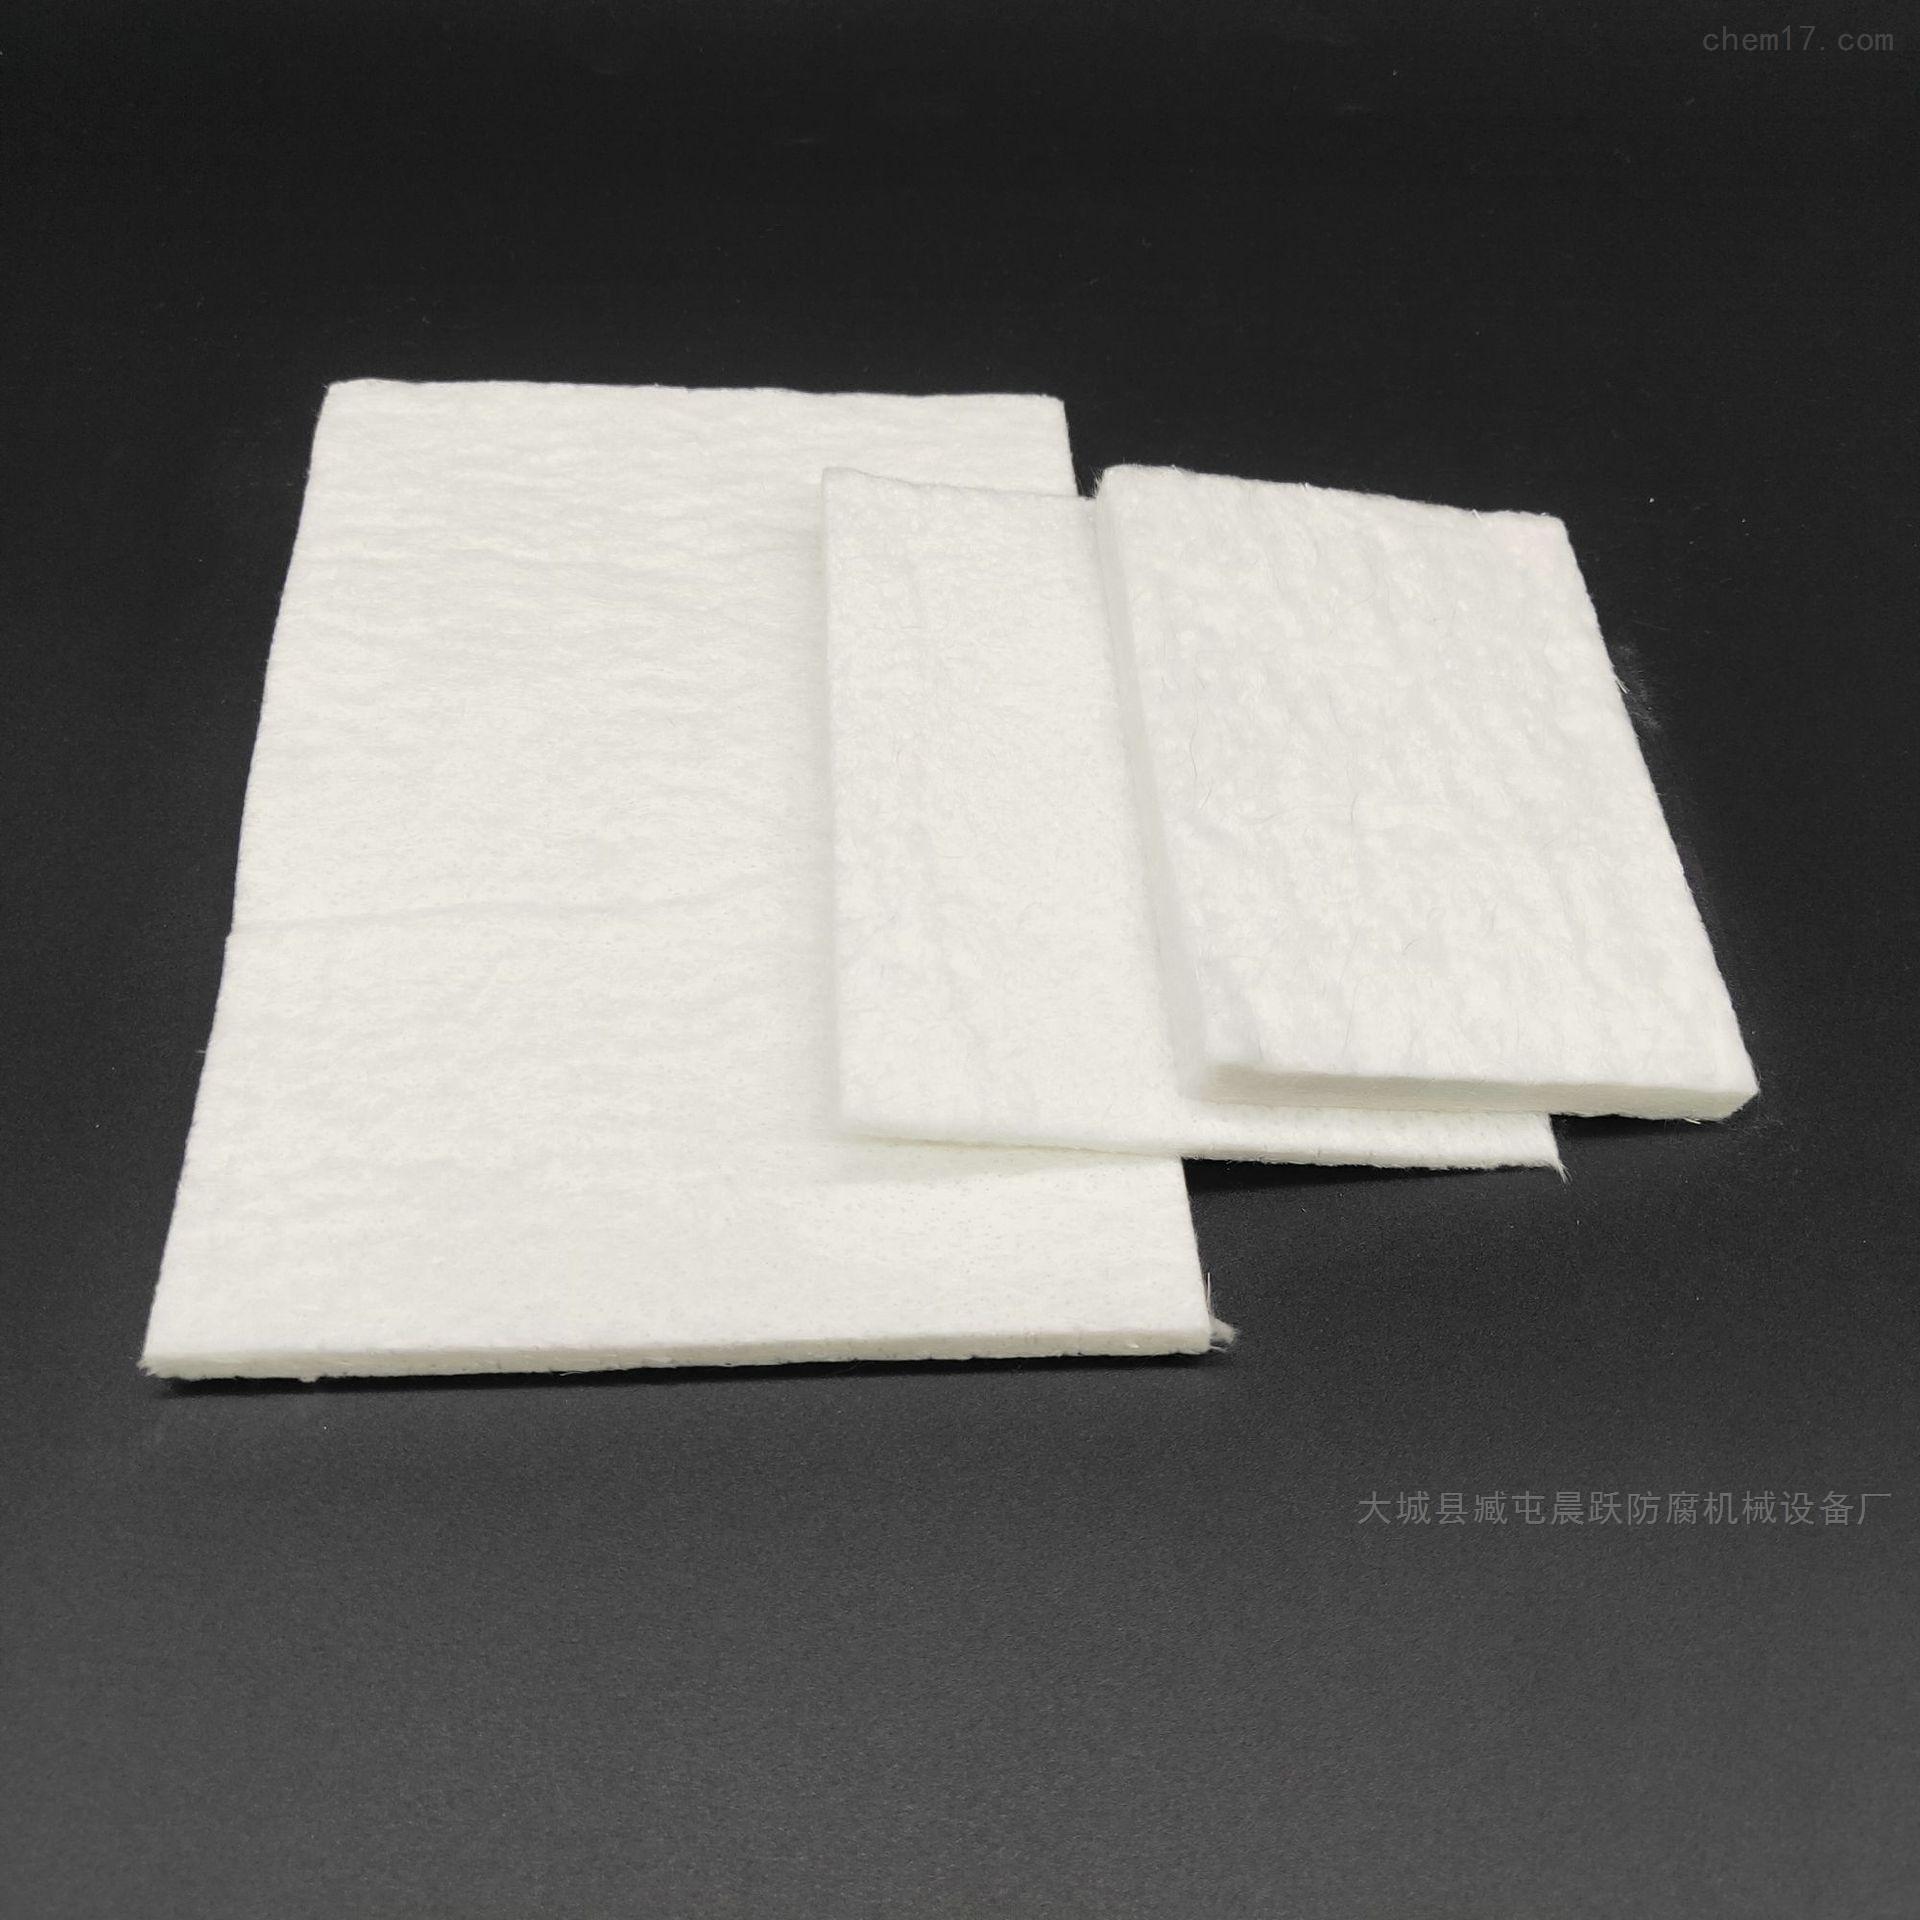 10mm纳米气凝胶毡  绝热保温棉规格选购常识